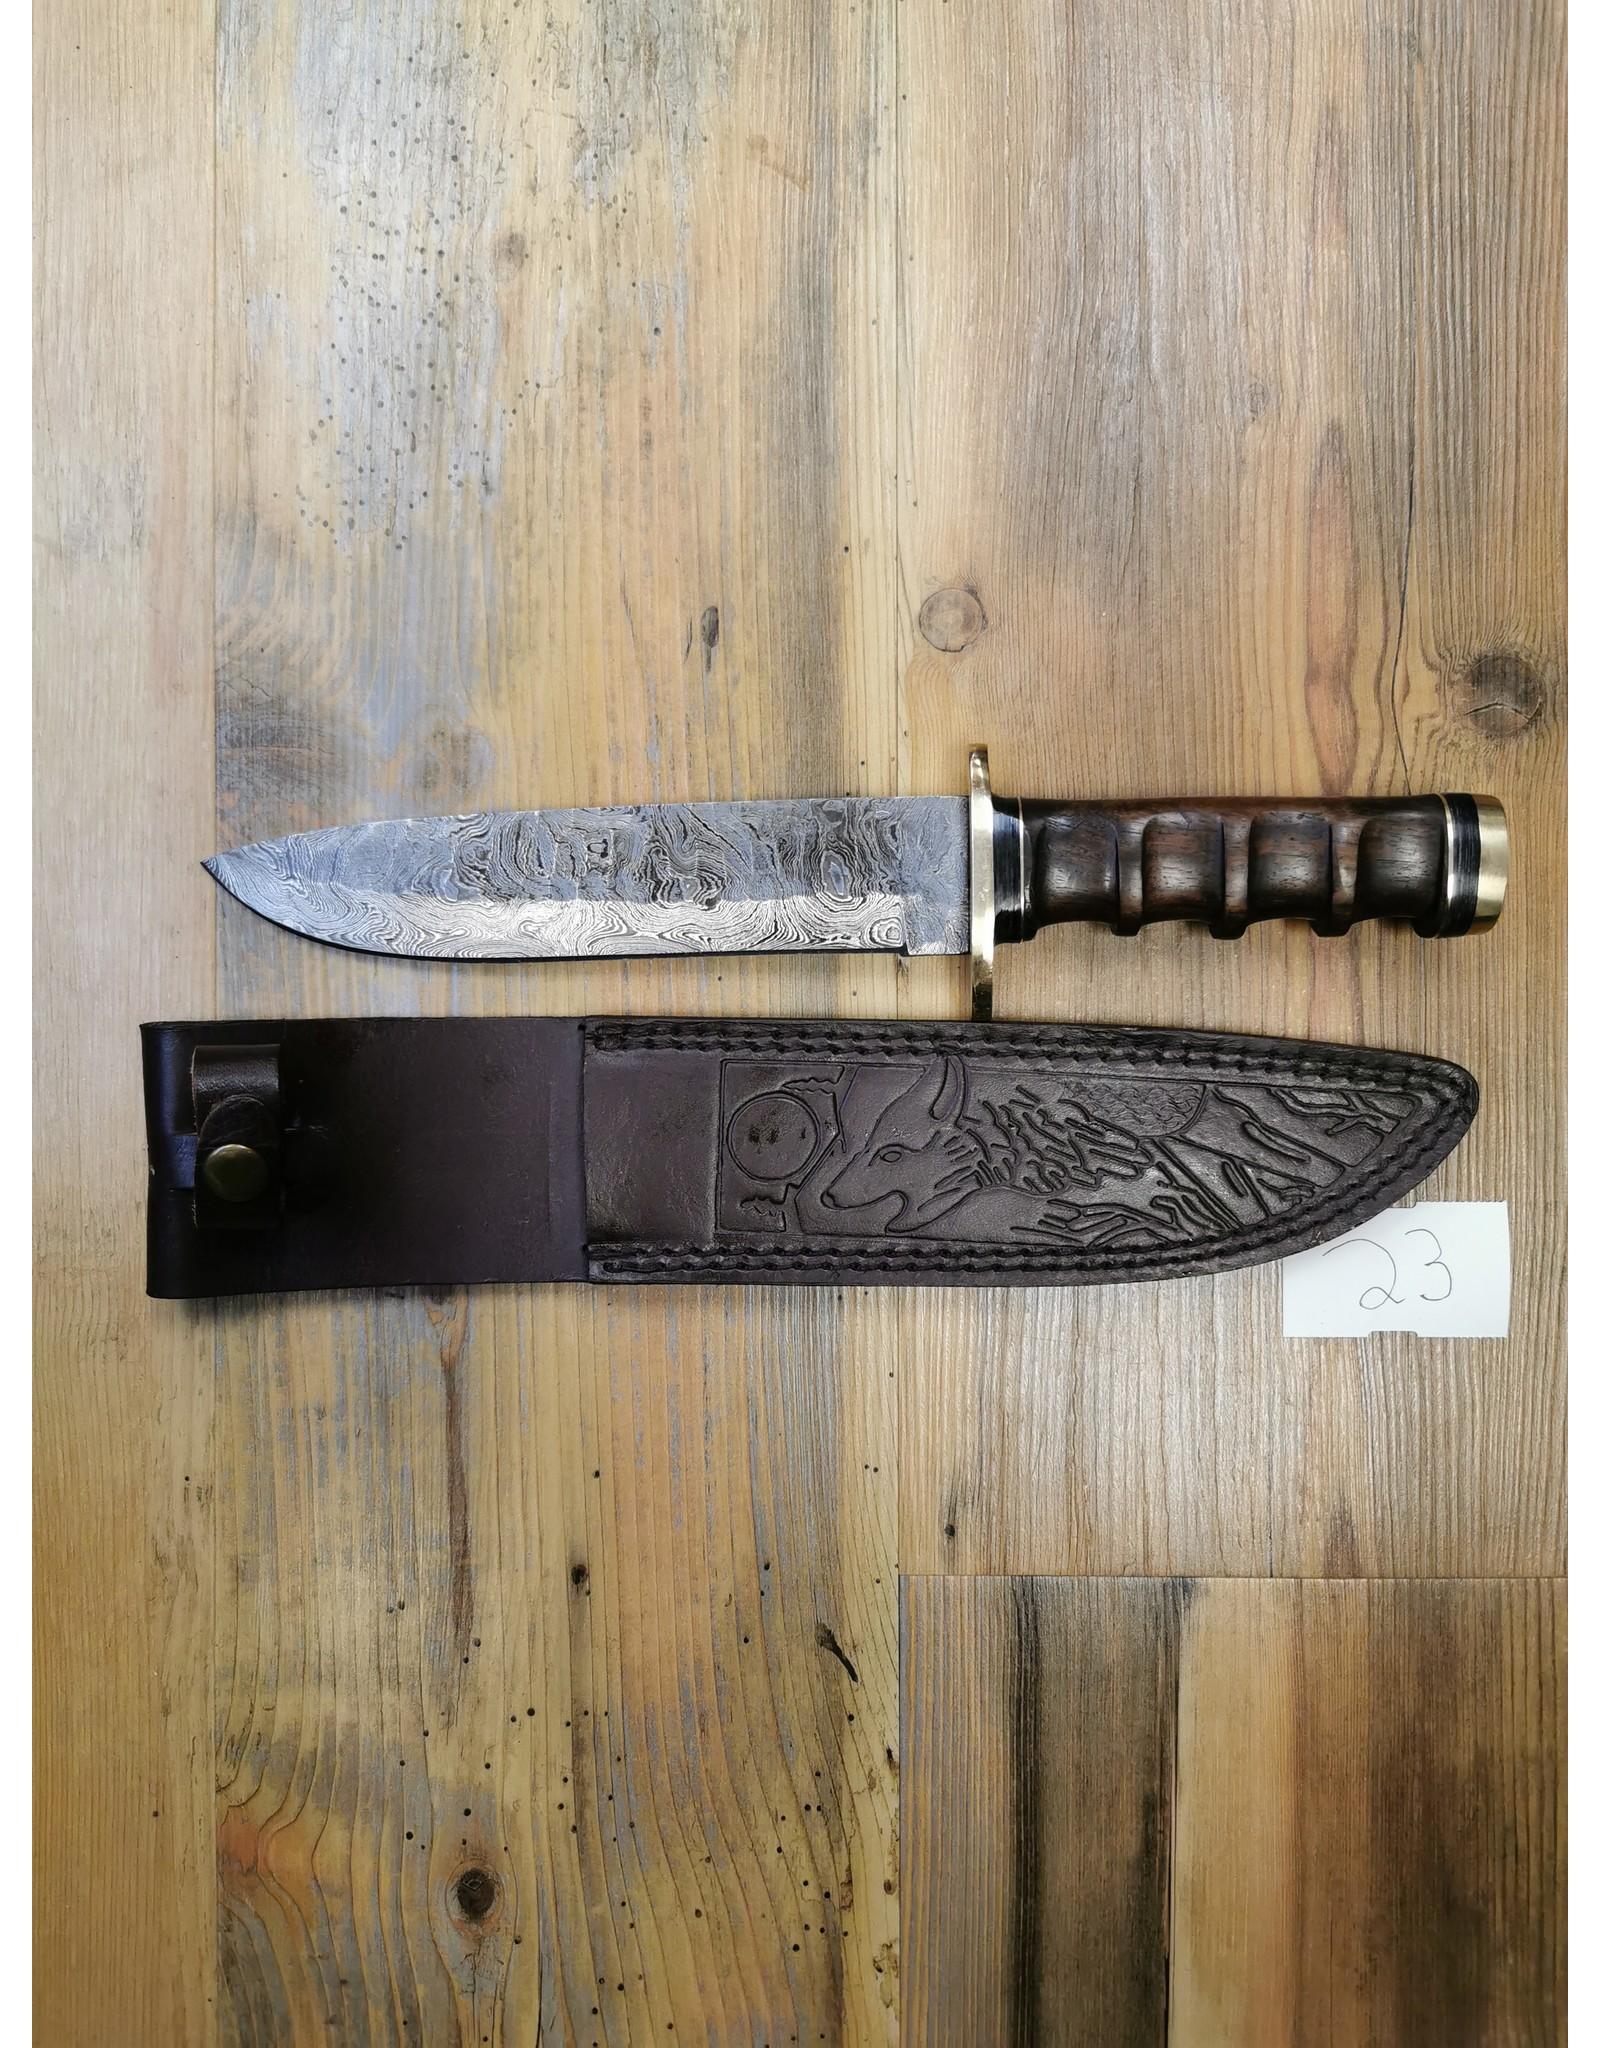 BAJWA ENTERPRISES DAMASCUS LARGE KNIFE #23